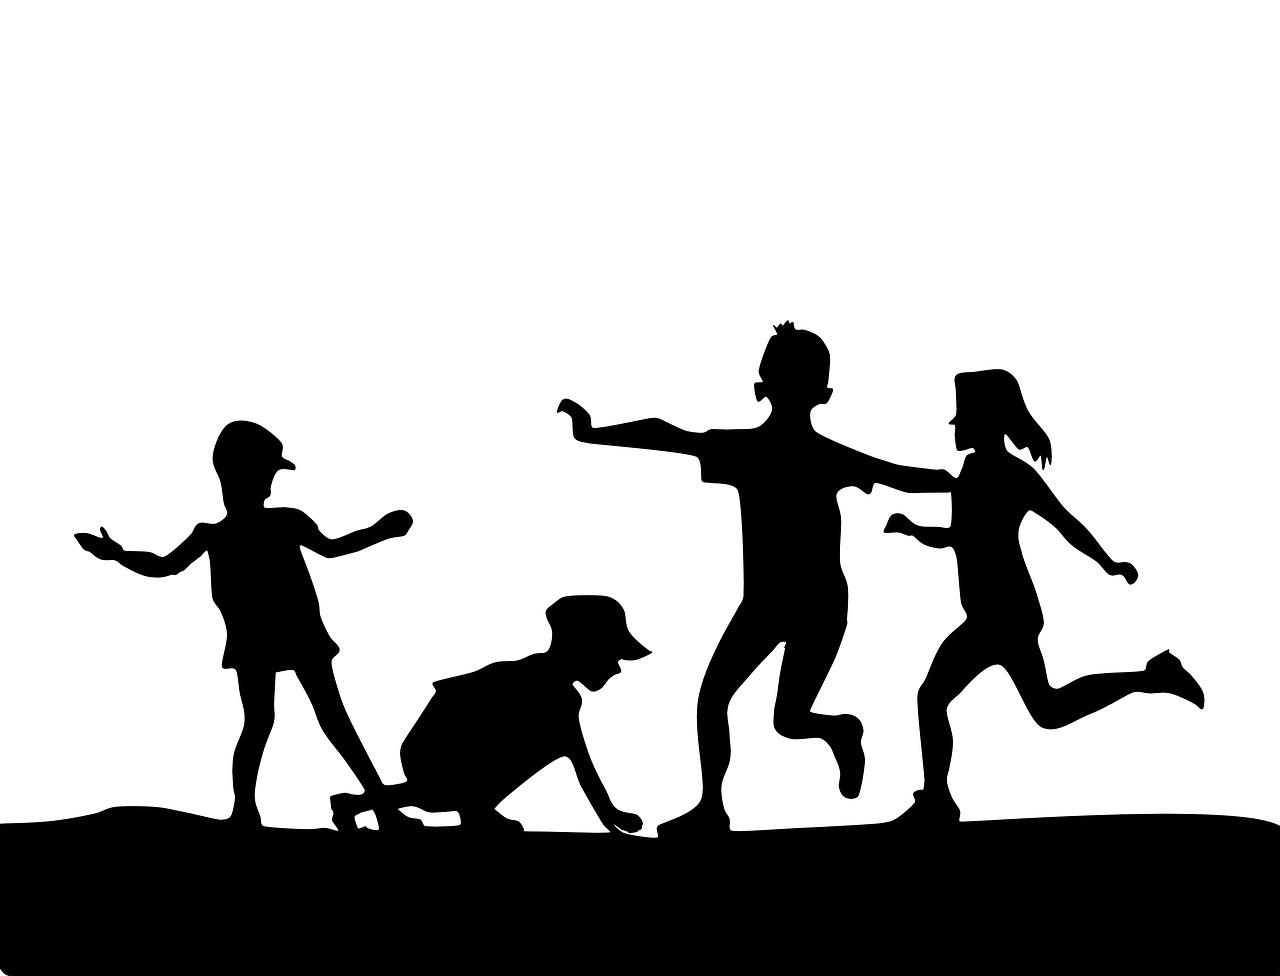 Child Playing Child Children S Day  - waldryano / Pixabay